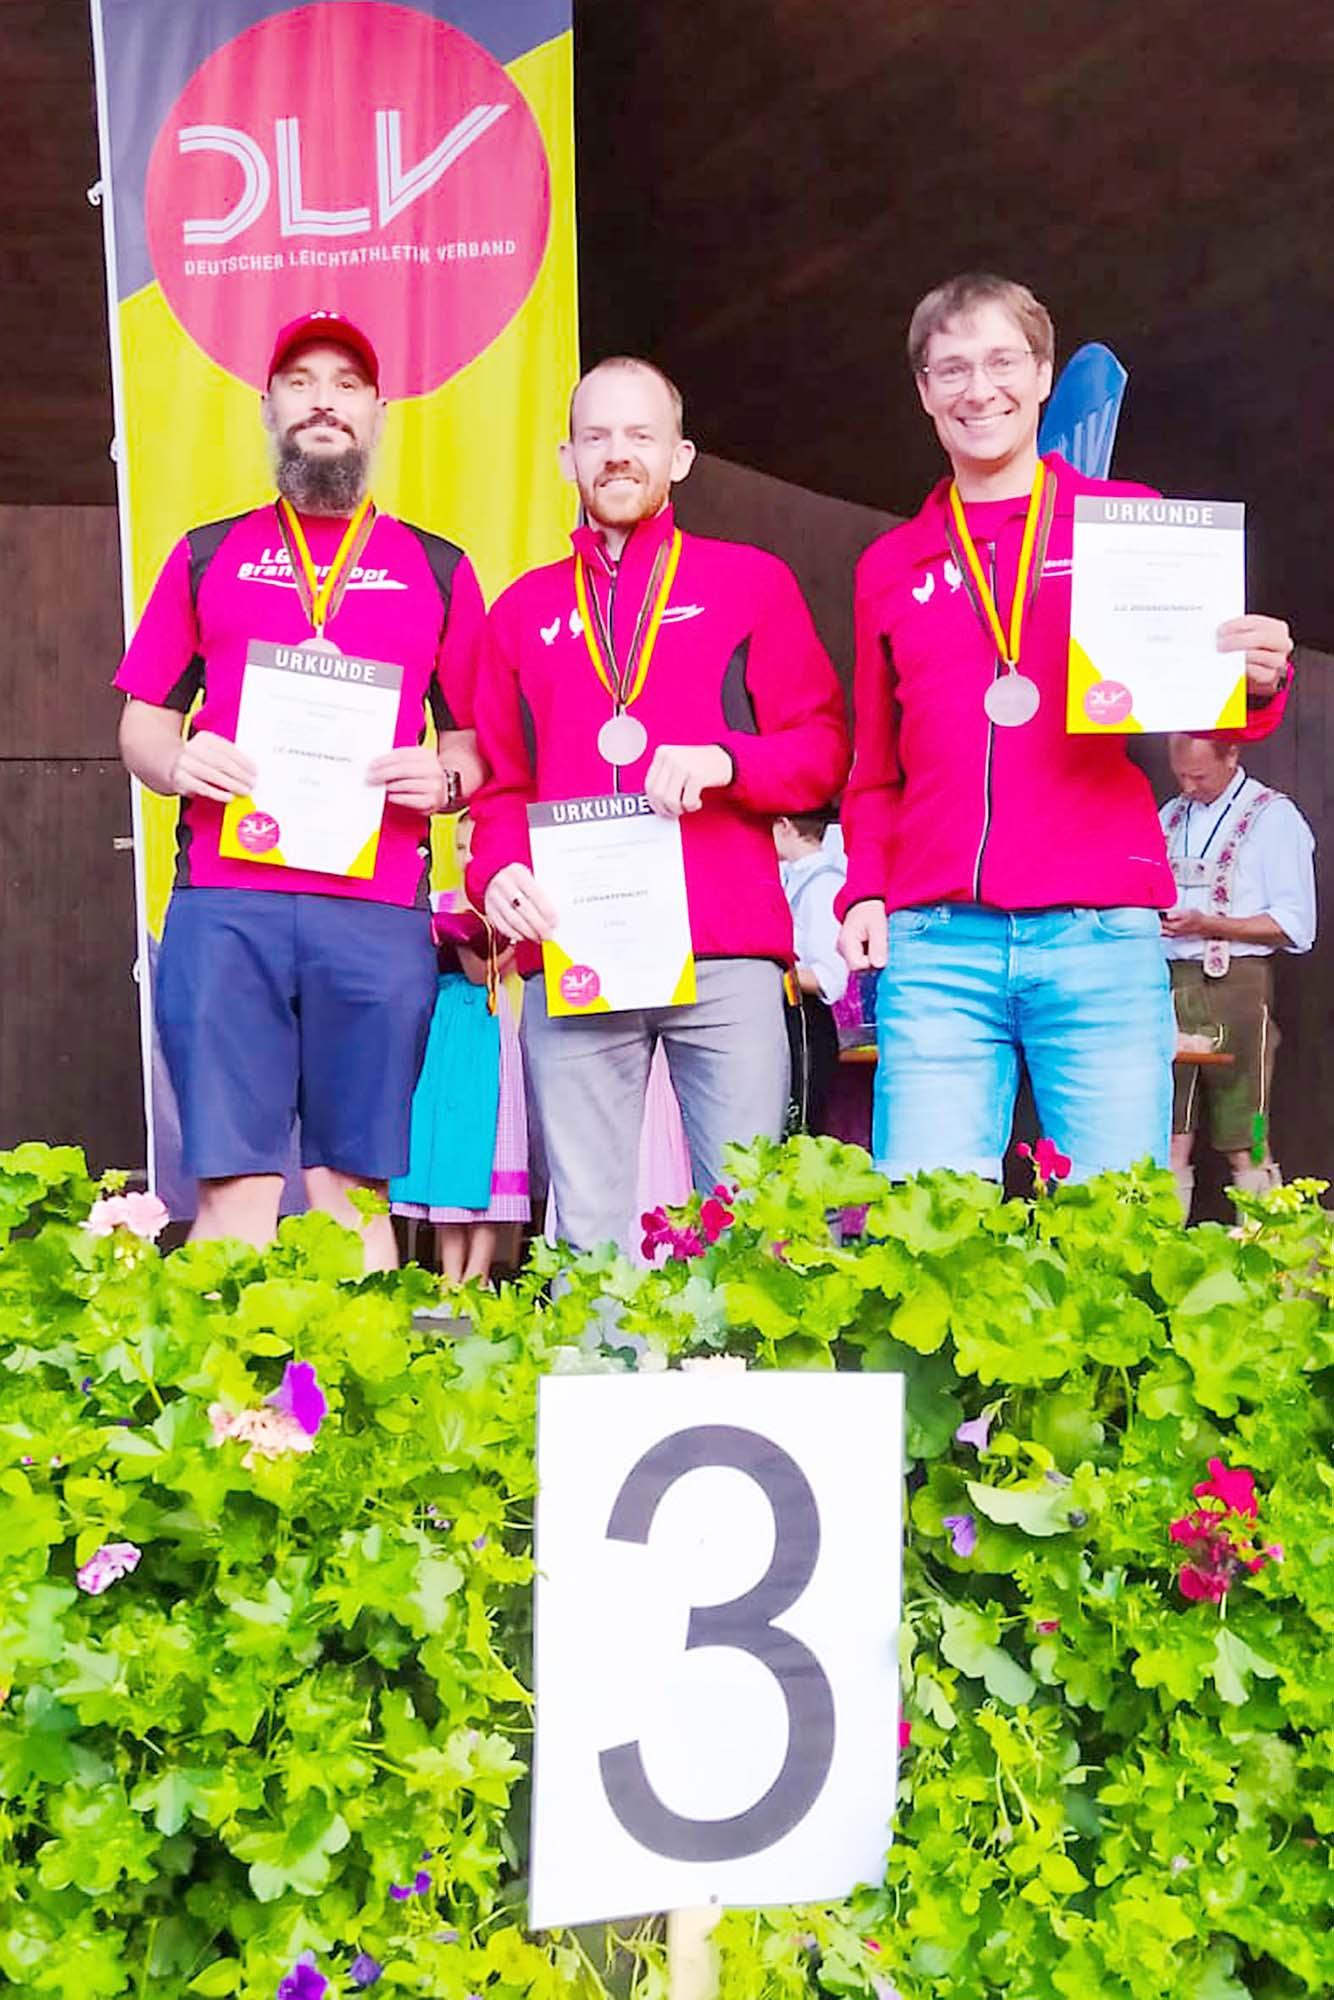 2021-9-22-ZE-as-Deutsche Berglaufmeisterschaften-PHOTO-2021-09-18-16-33-35